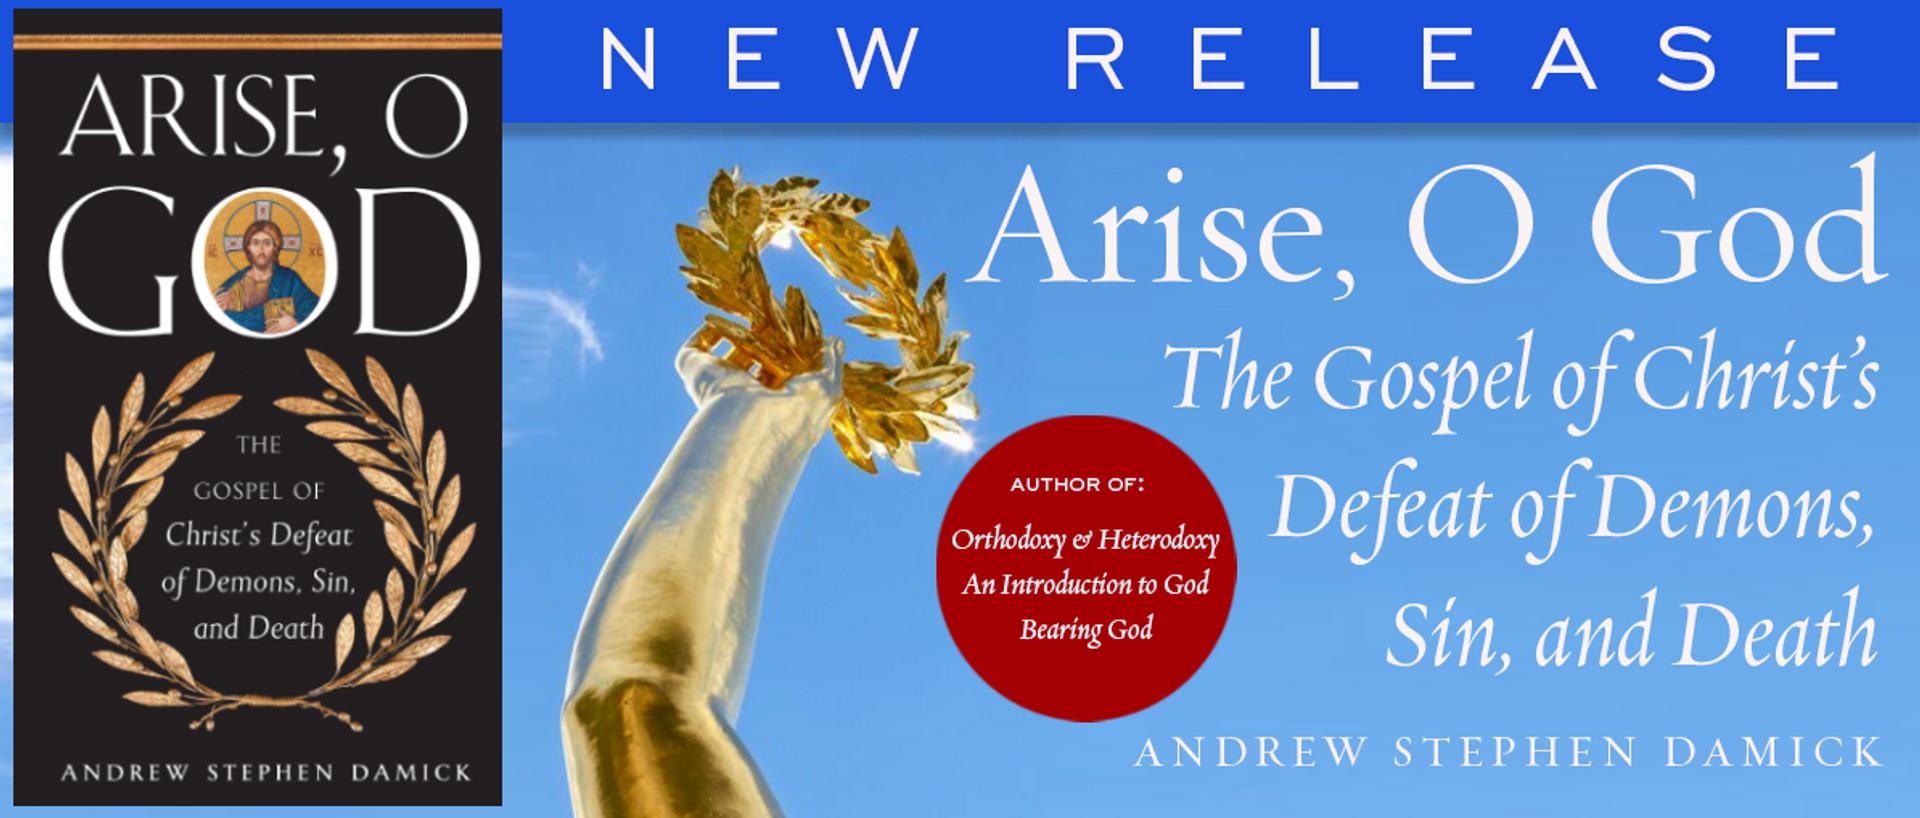 Arise, O God by Fr Andrew Stephen Damick